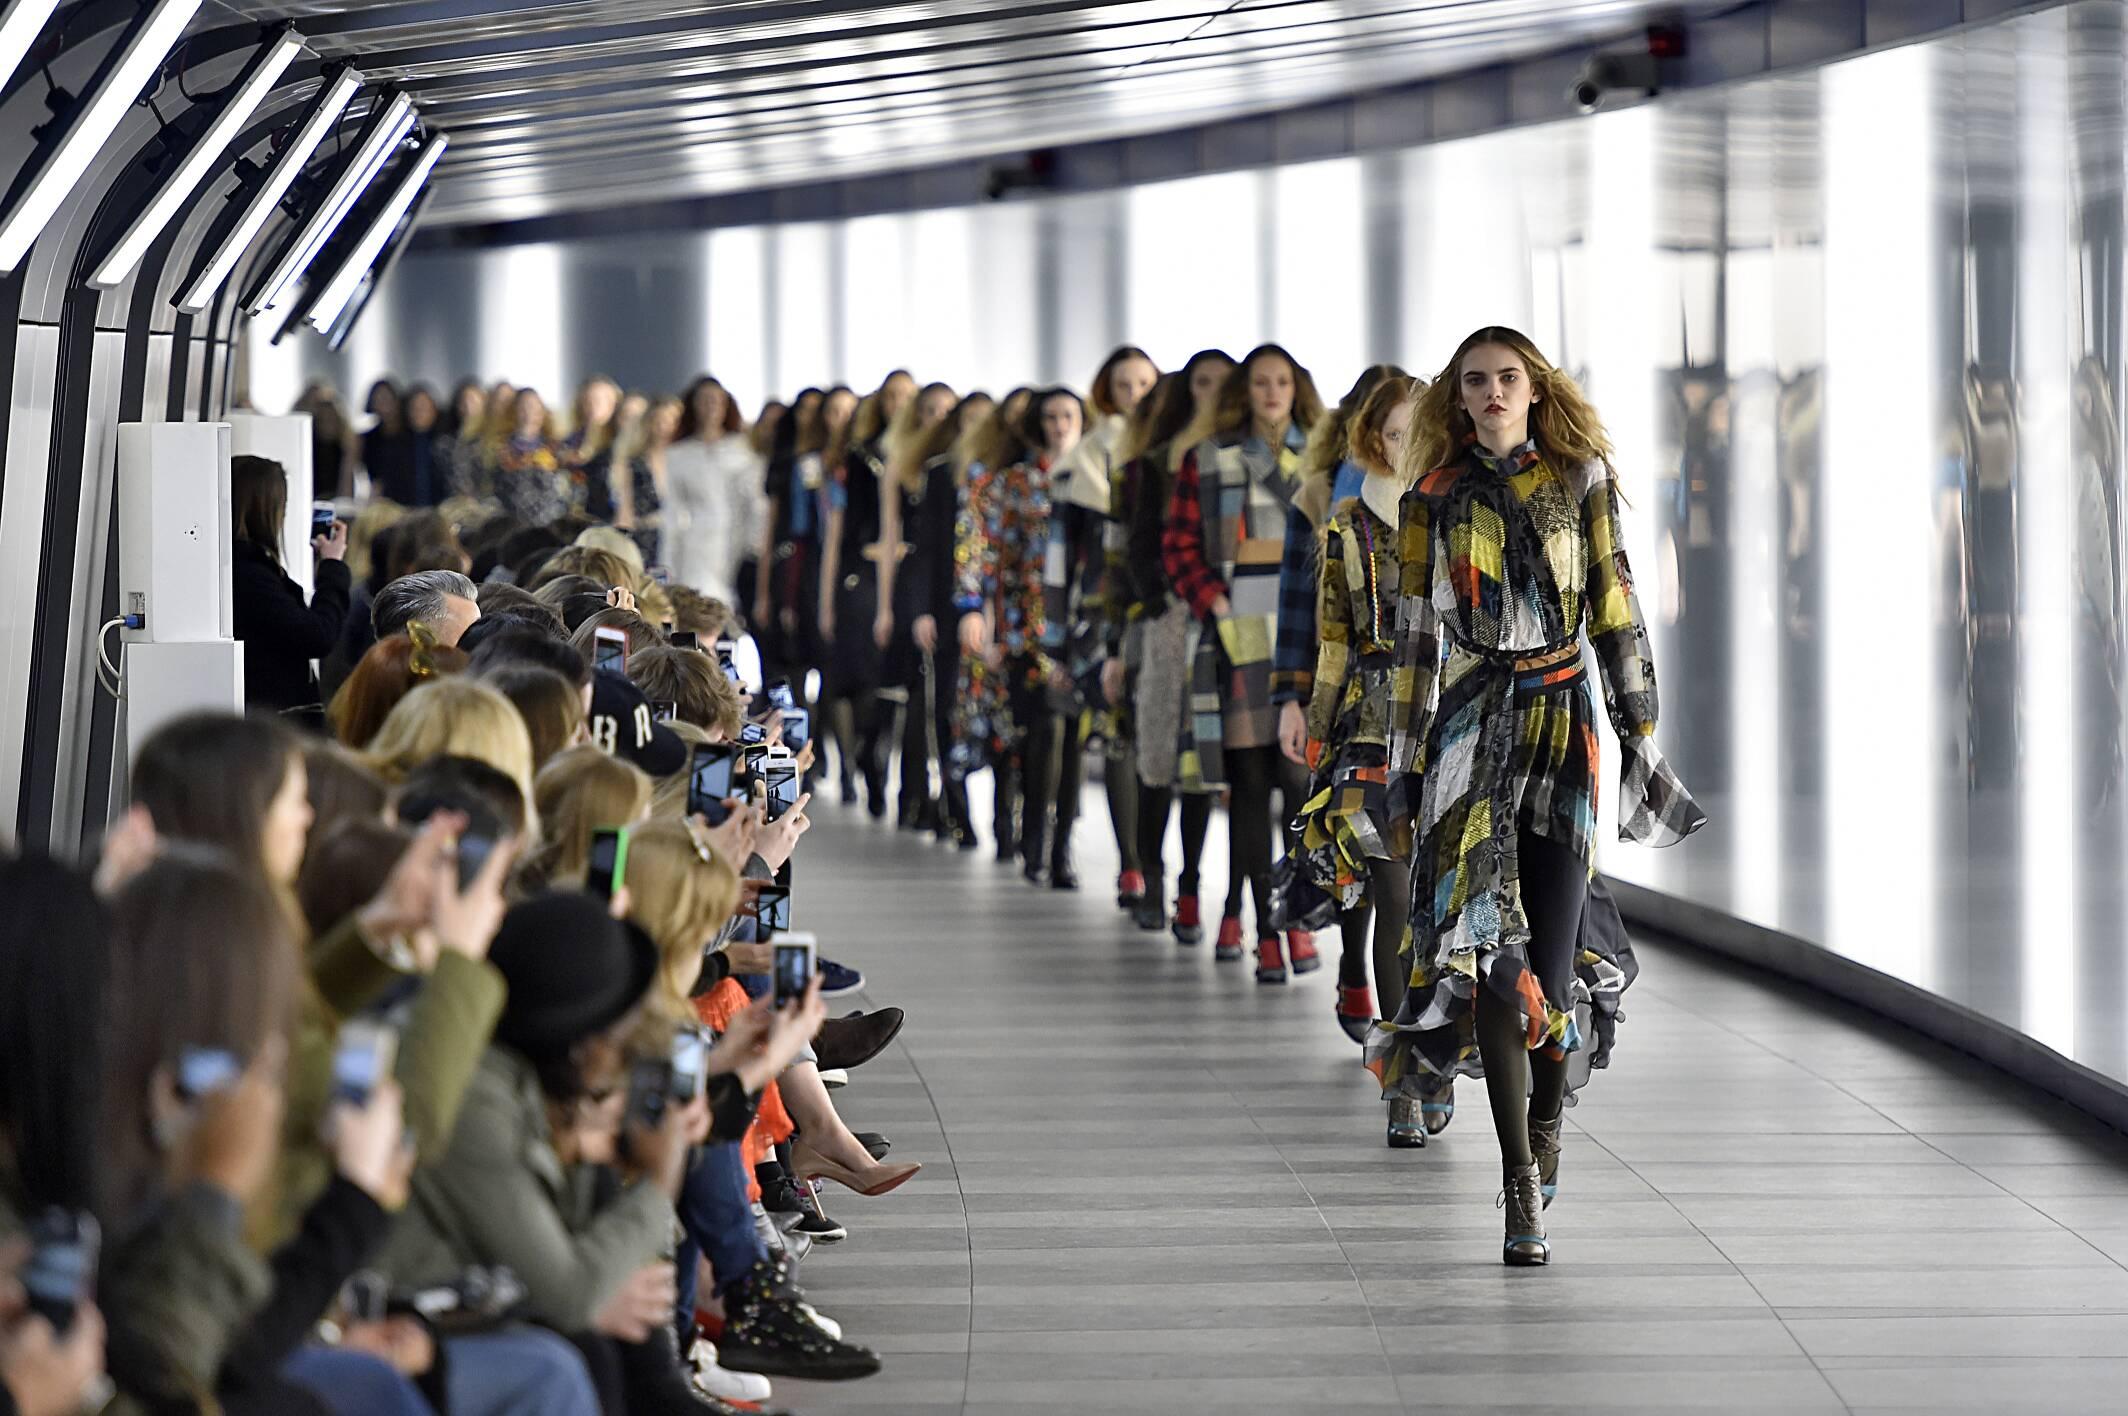 Preen by Thornton Bregazzi Fashion Show 2015 Finale